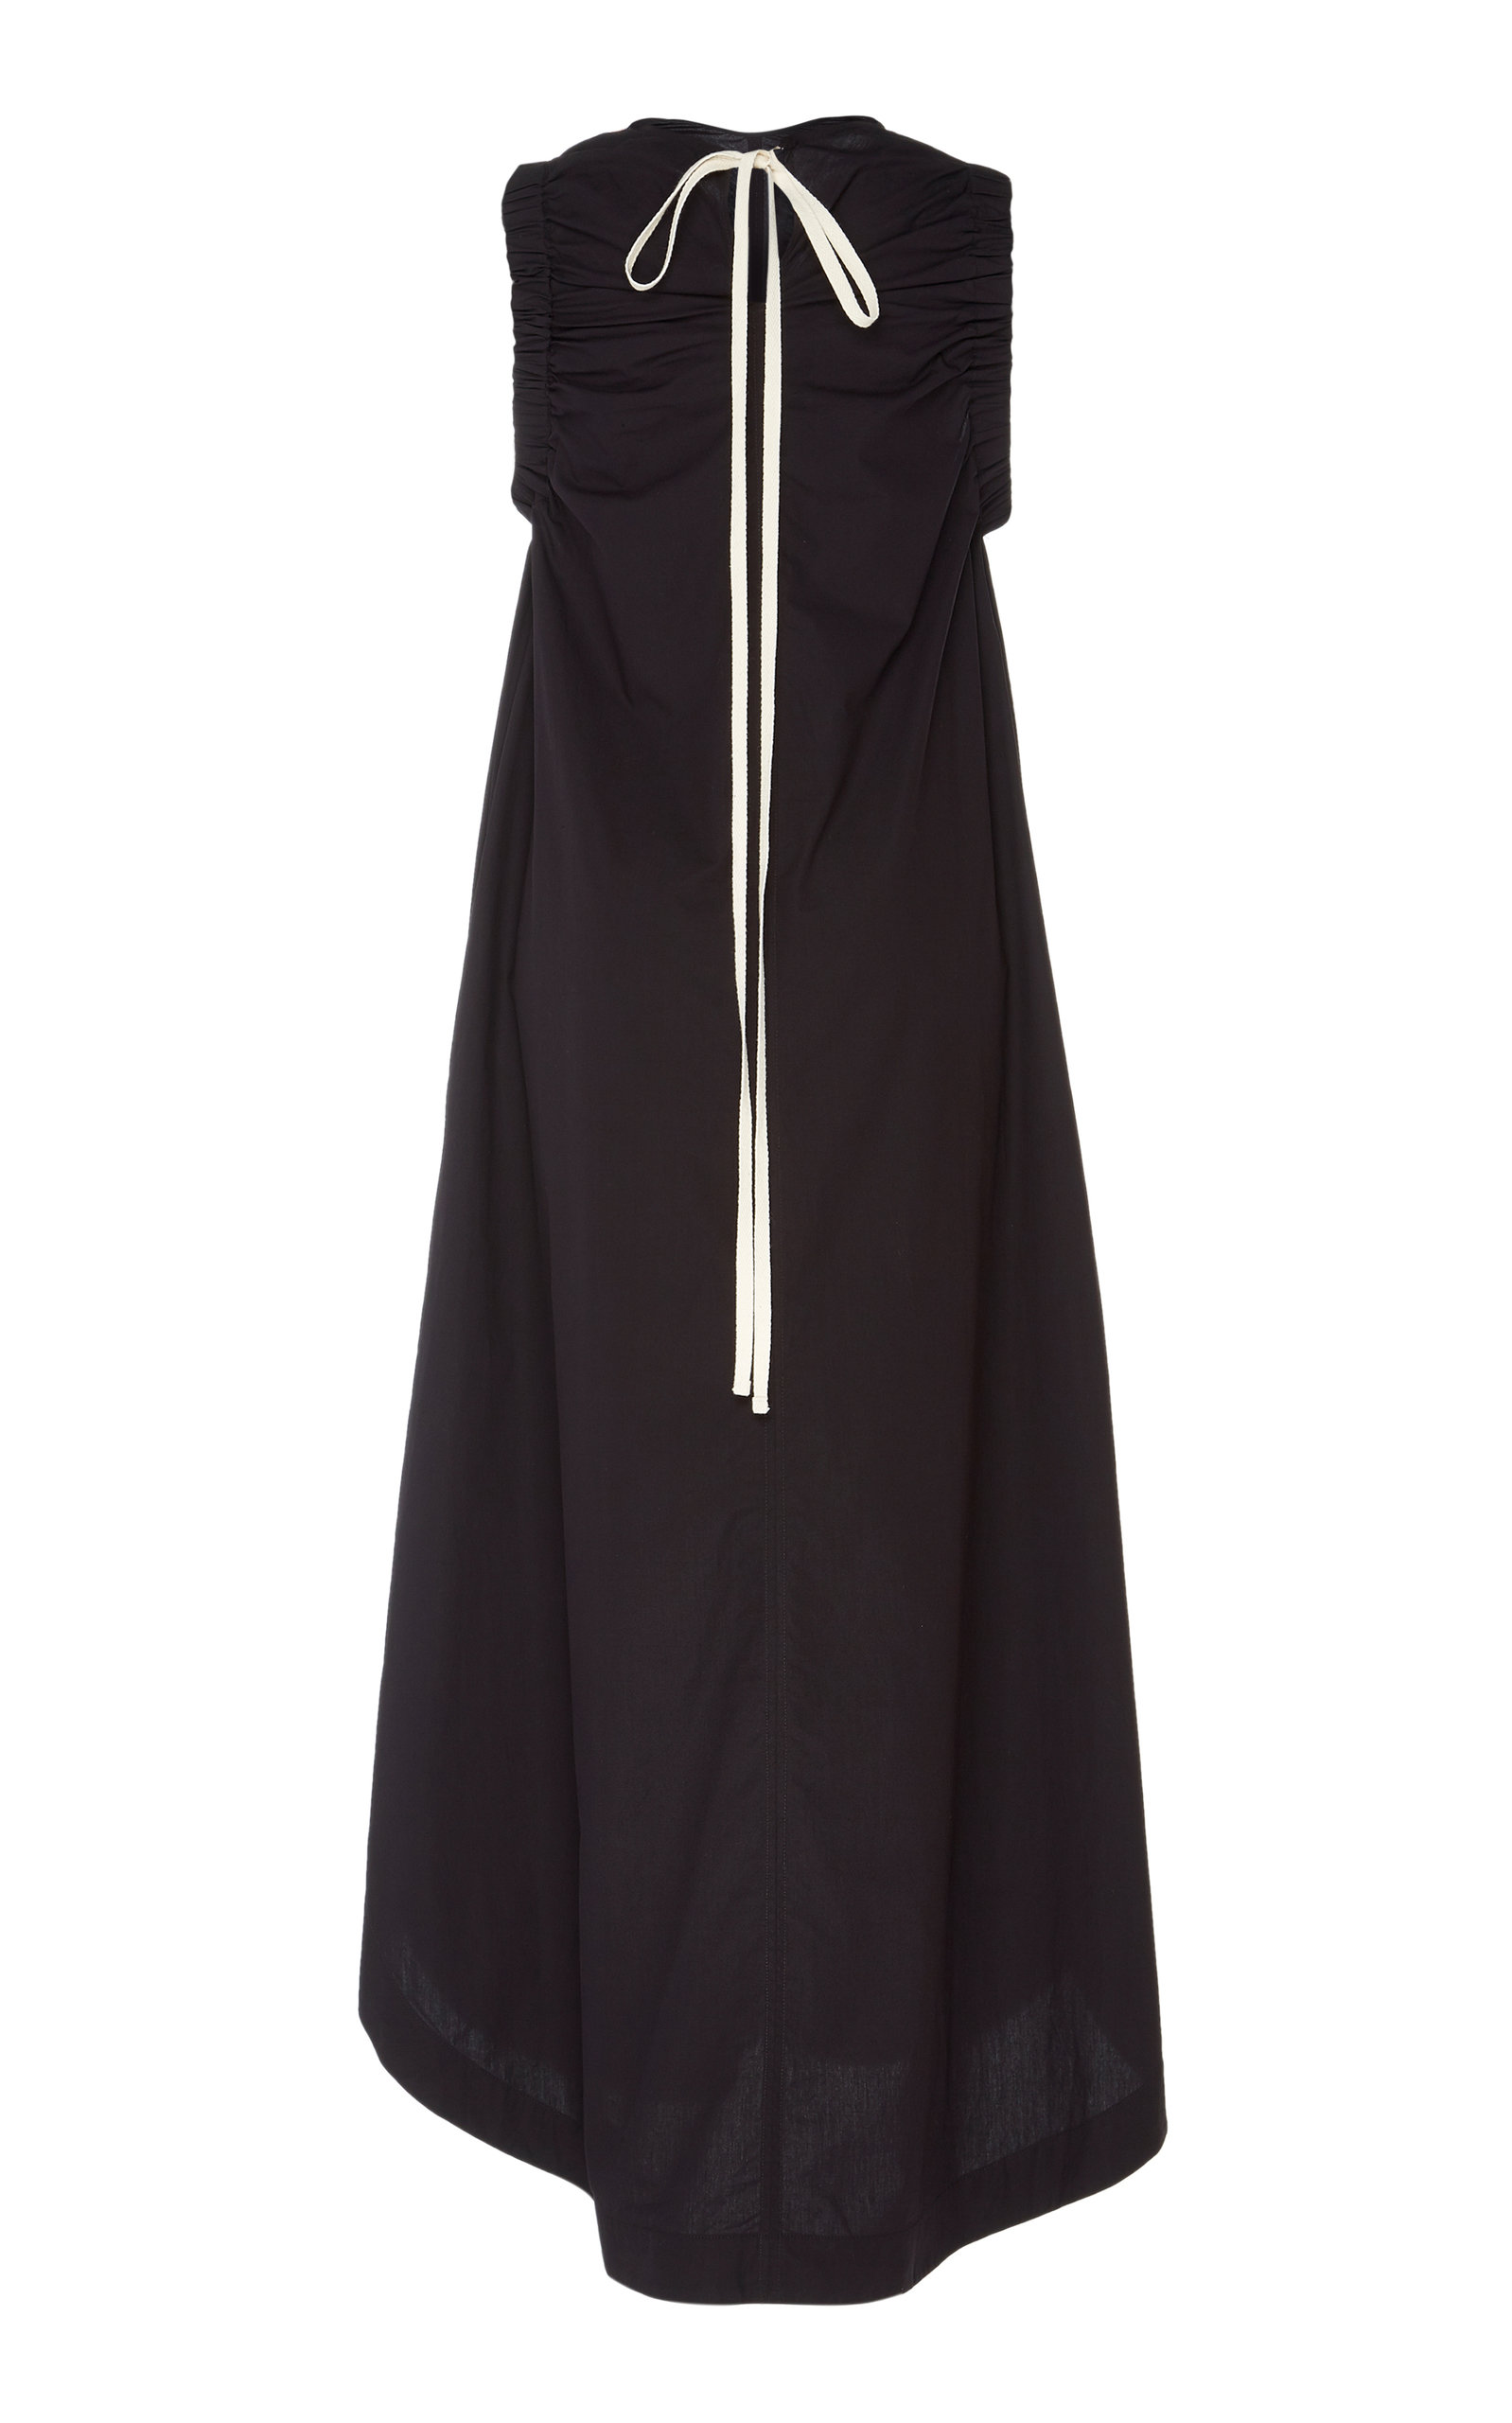 Lee Mathews Dresses Elsie Ruched Cotton-Blend Midi Dress